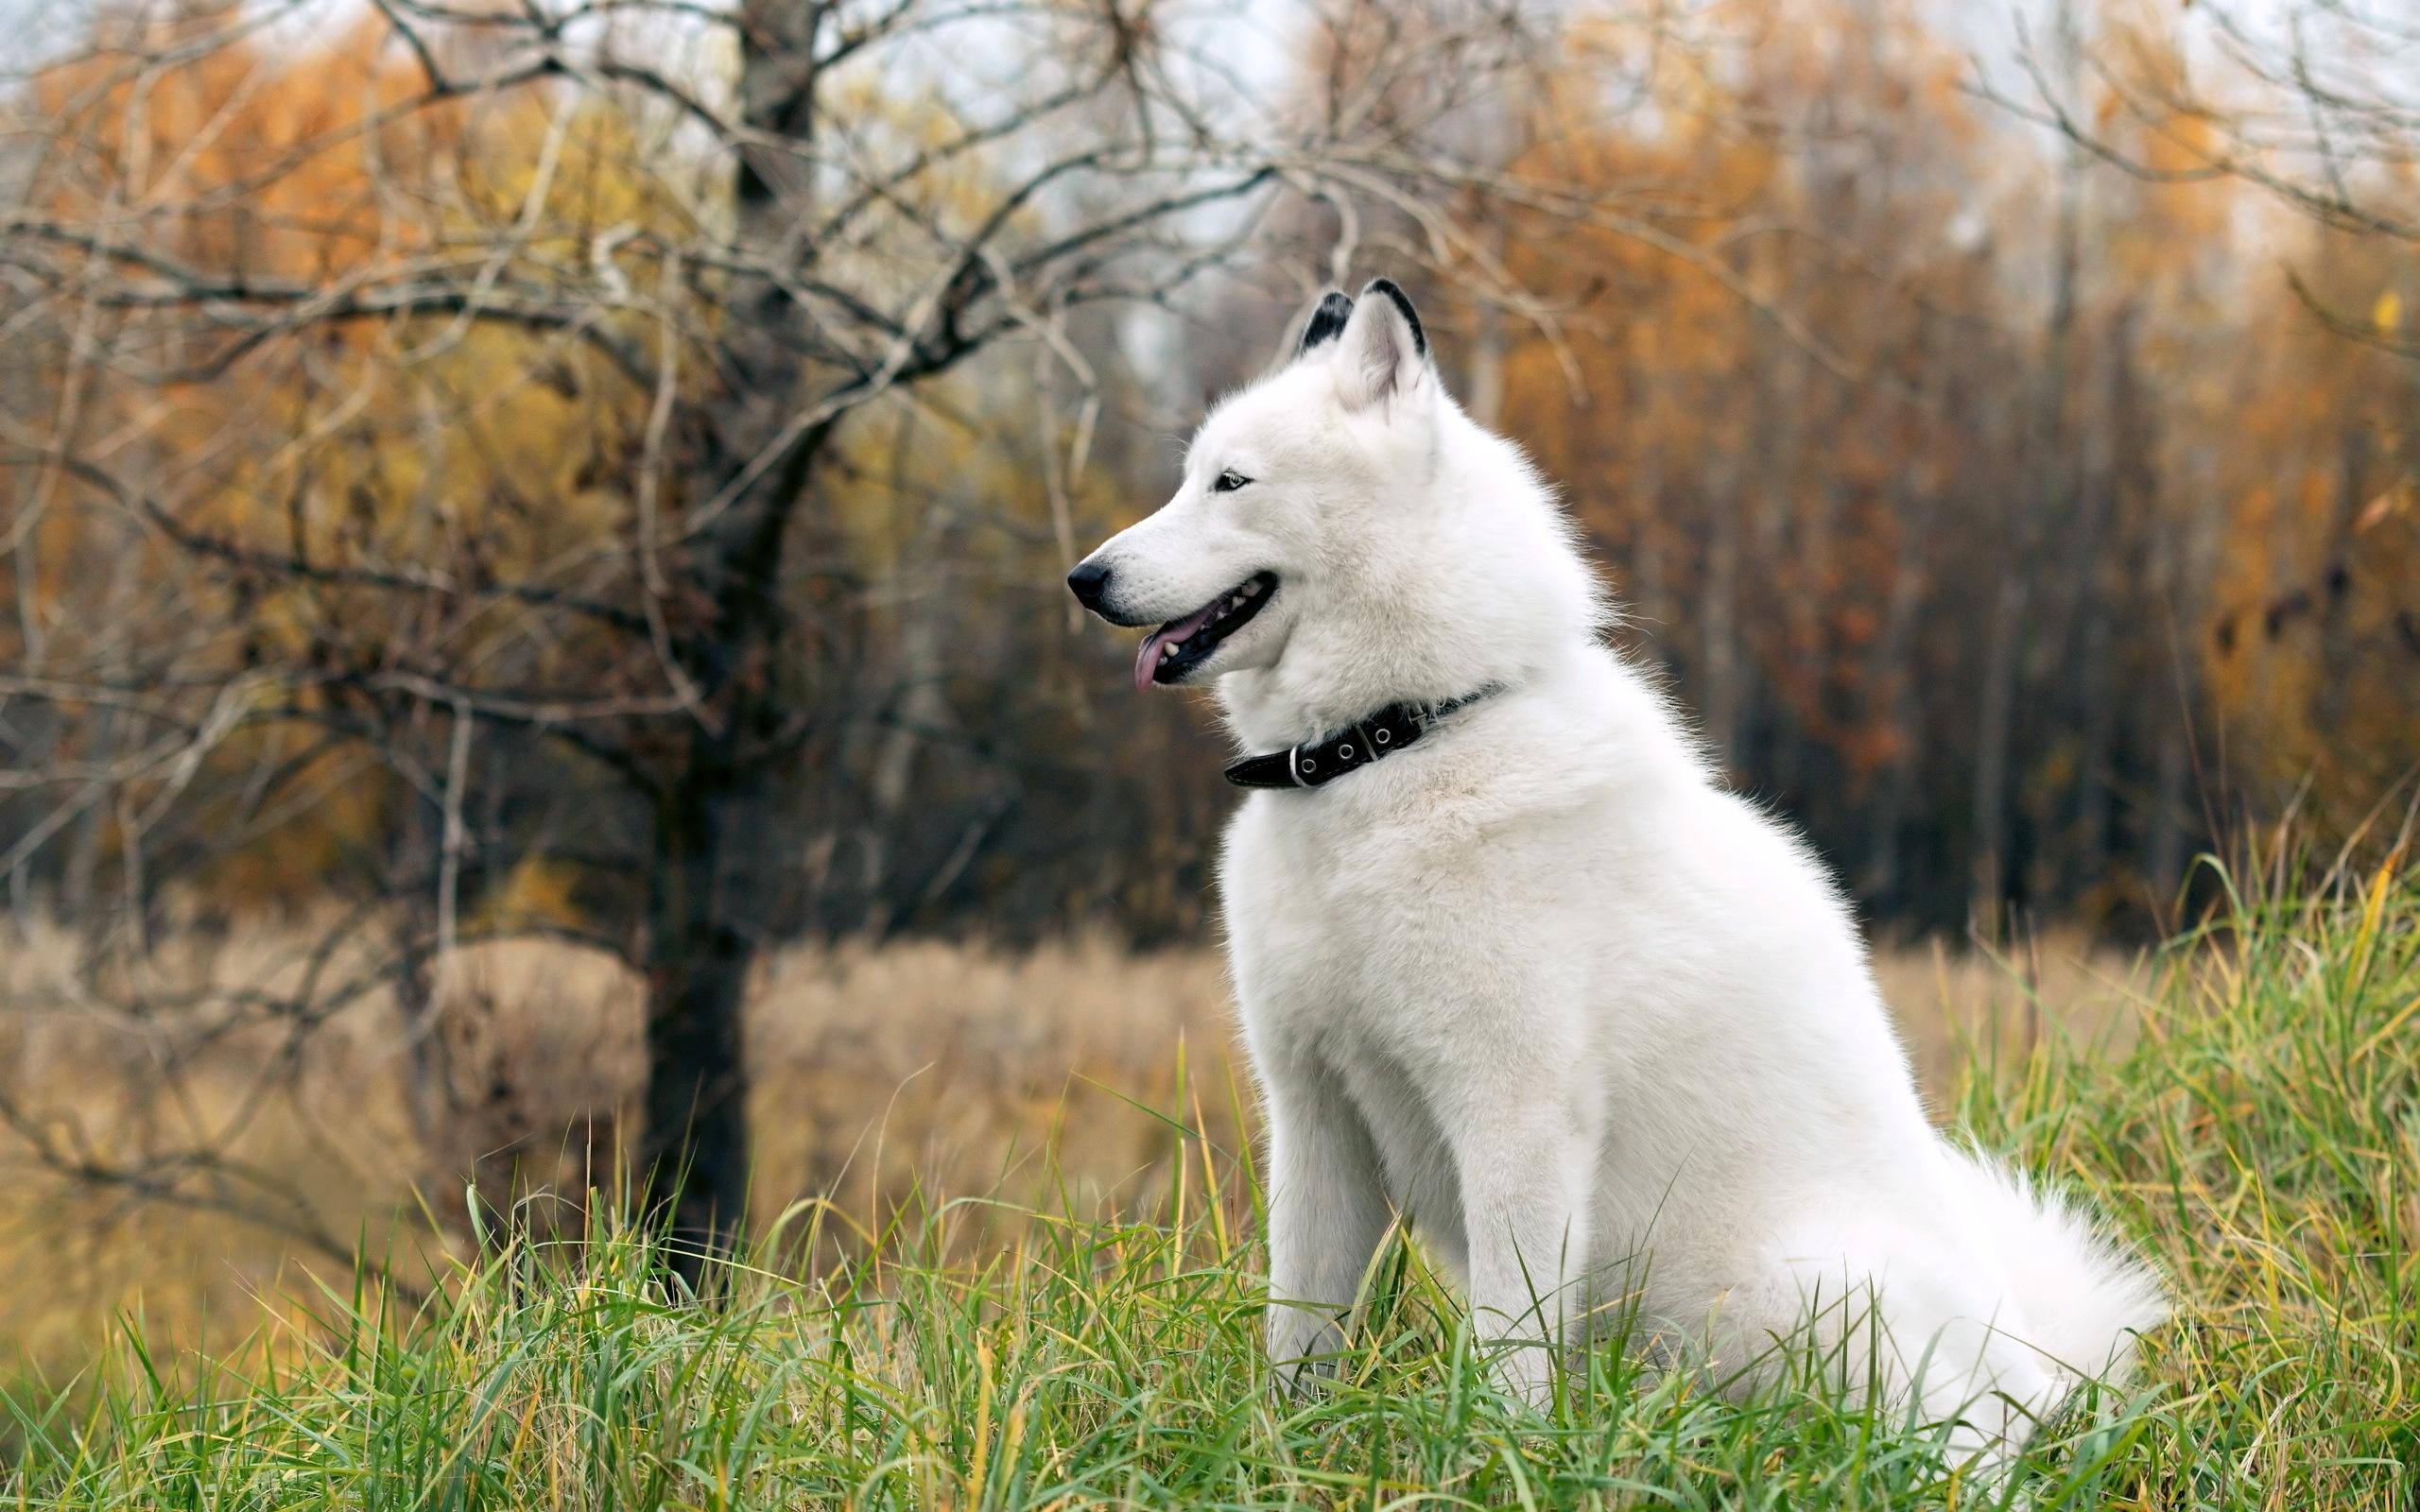 Perros Husky Siberiano Fondos De Pantalla Hd De Animales 2: Fondos De Pantalla Perro Husky En La Hierba 2560x1600 HD